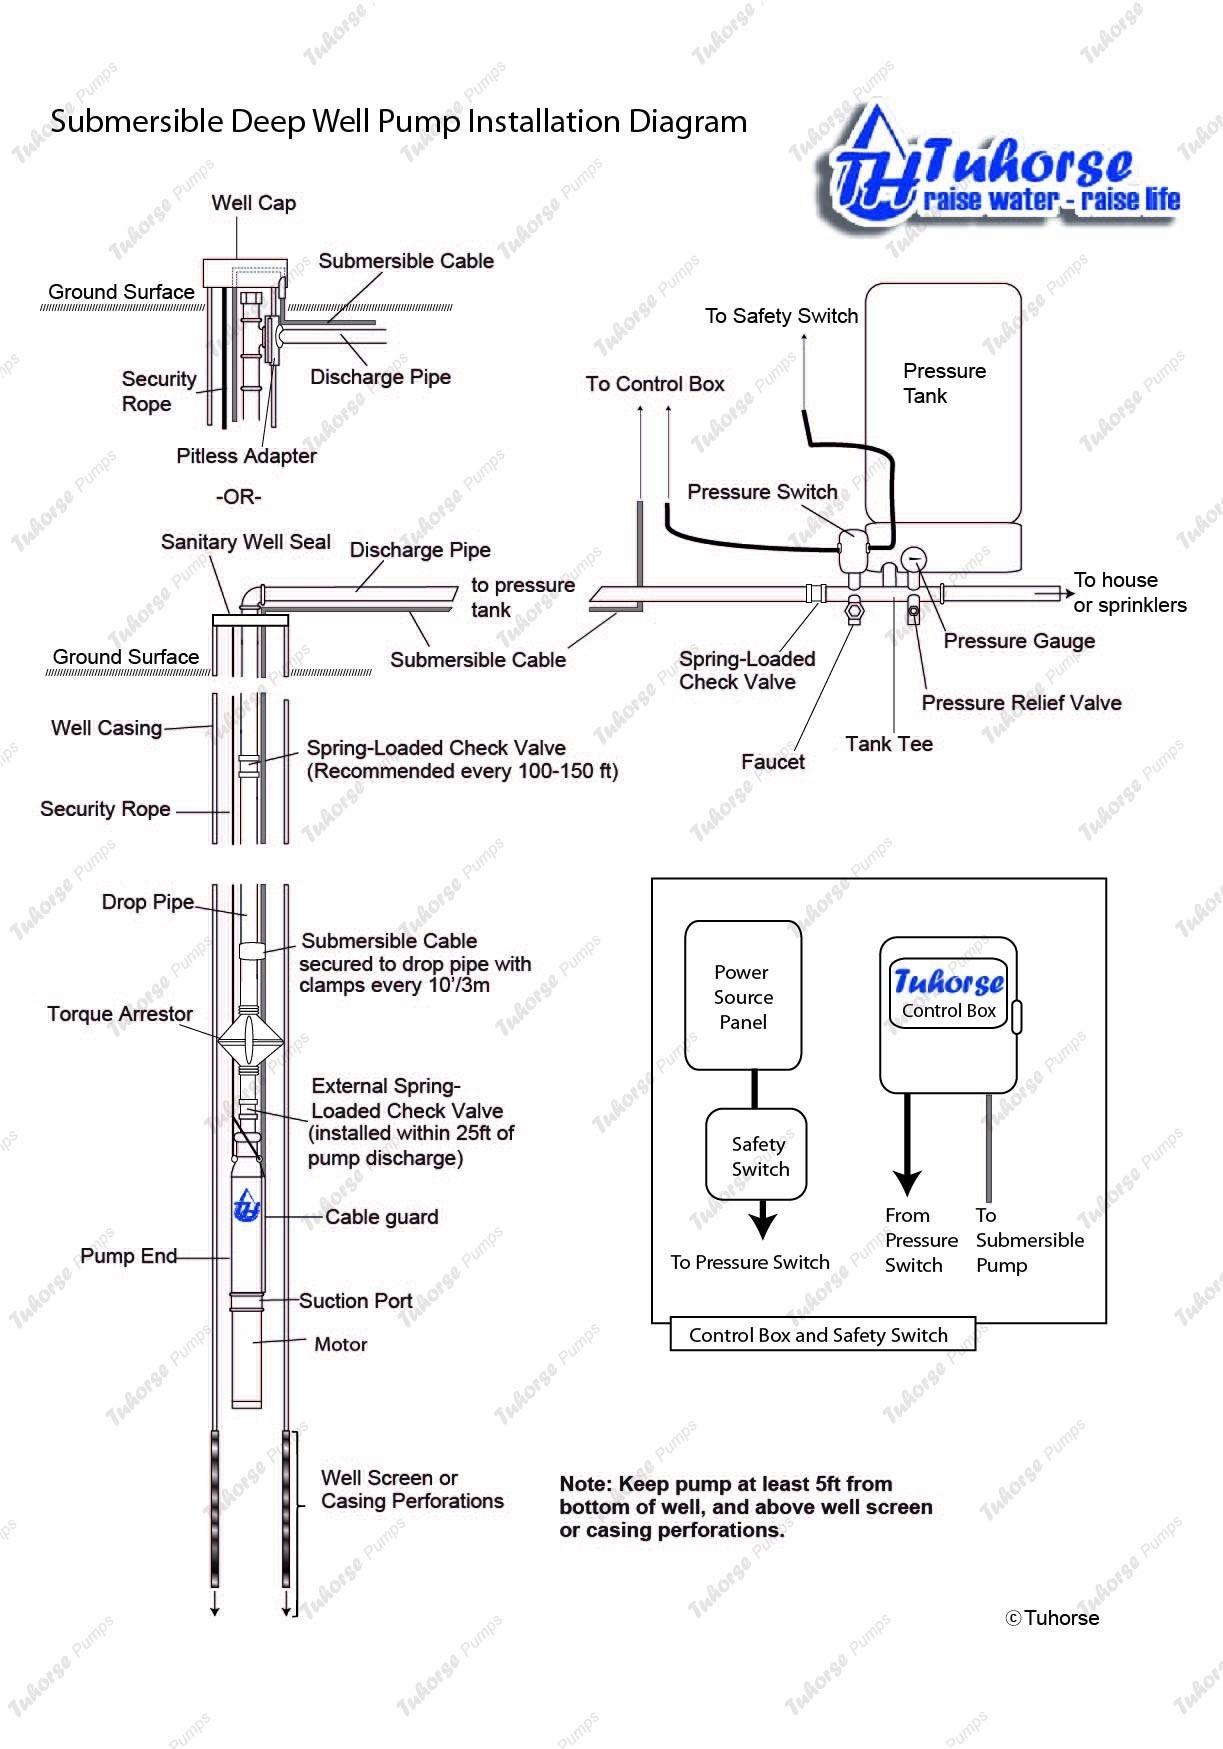 Well Pump Pressure Switch Wiring Diagram Wiring Diagram Pressure Switch Valid Grundfos Pump Wiring Diagram Of Well Pump Pressure Switch Wiring Diagram